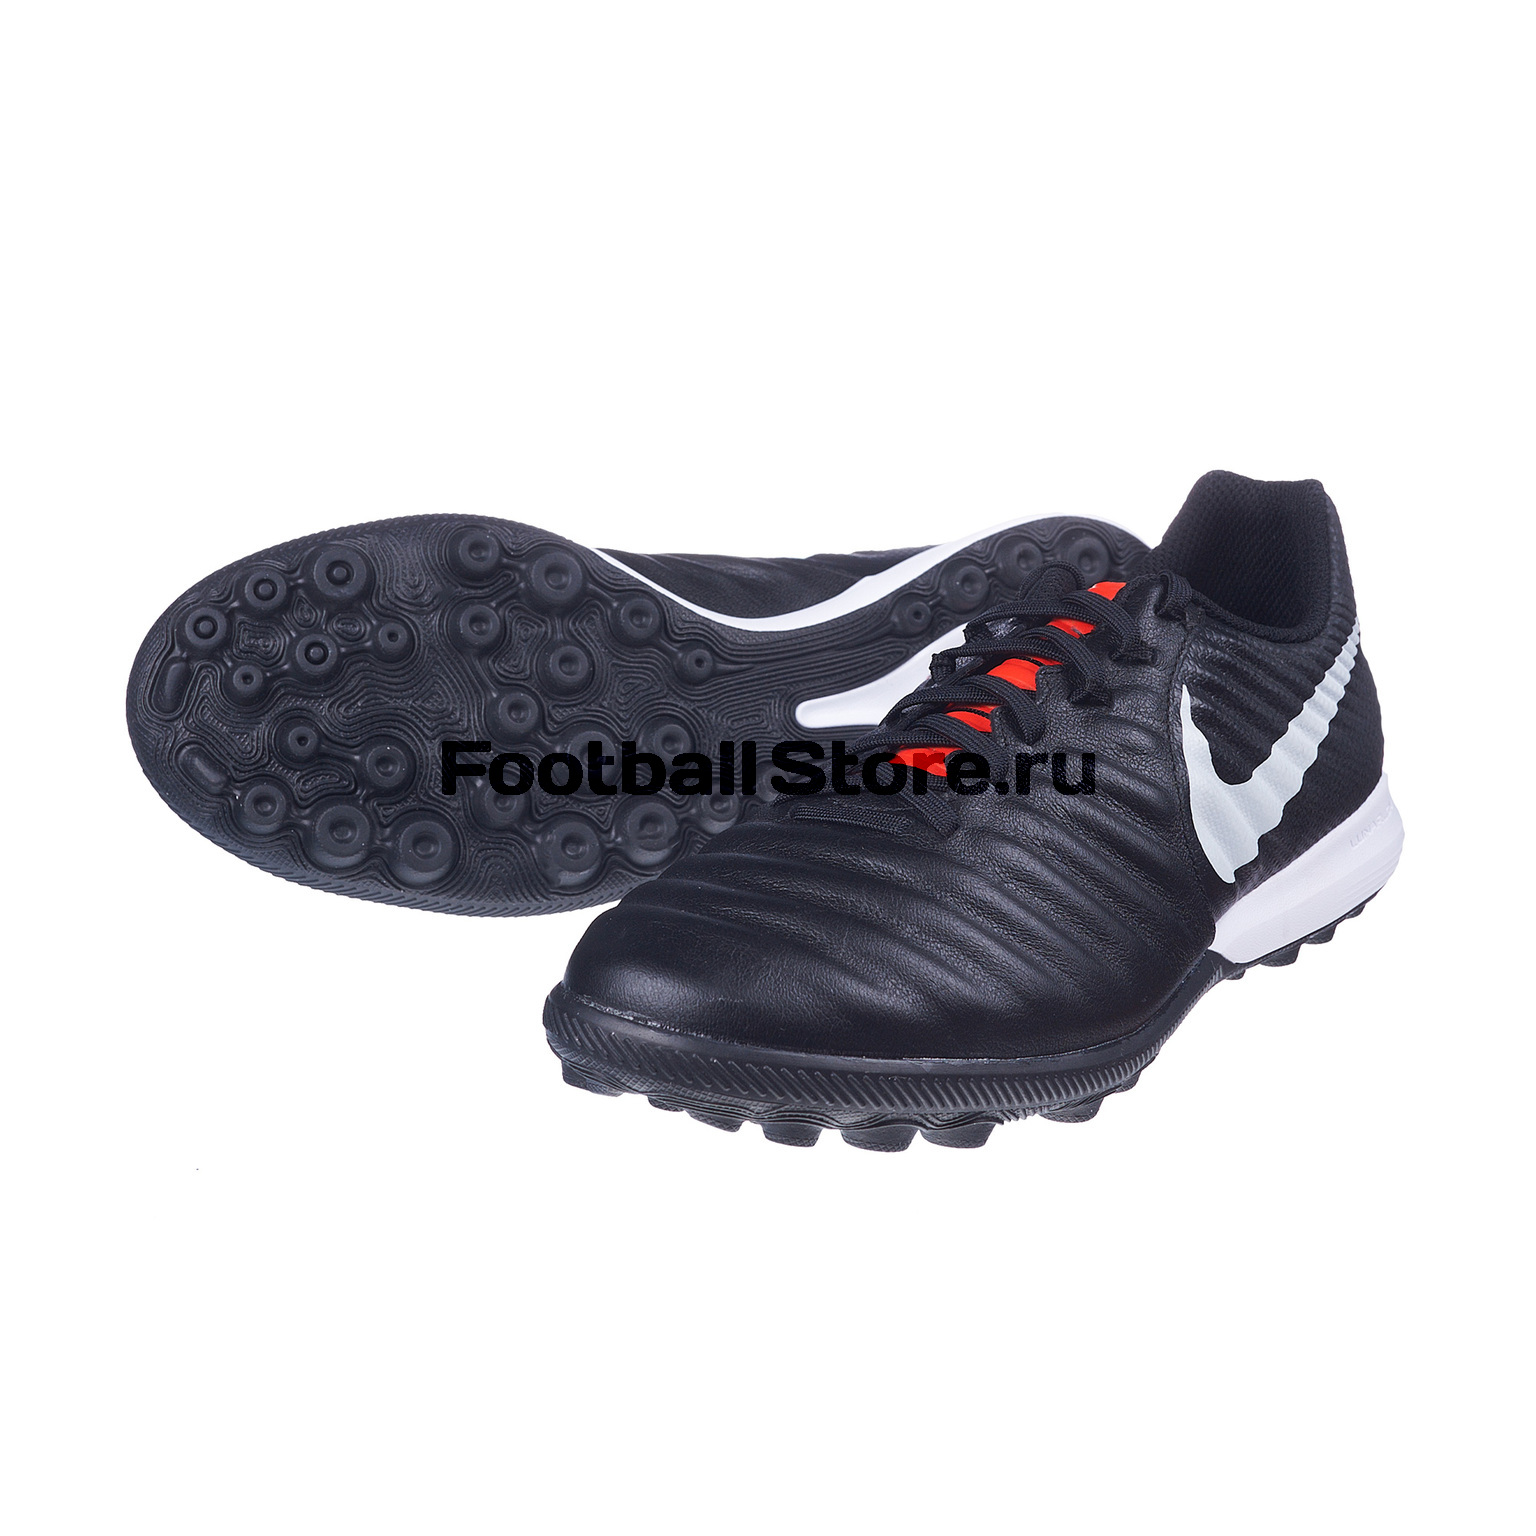 Шиповки Nike Tiempo Legend X 7 Pro TF AH7249-006 шиповки nike lunar legendx 7 pro tf ah7249 080